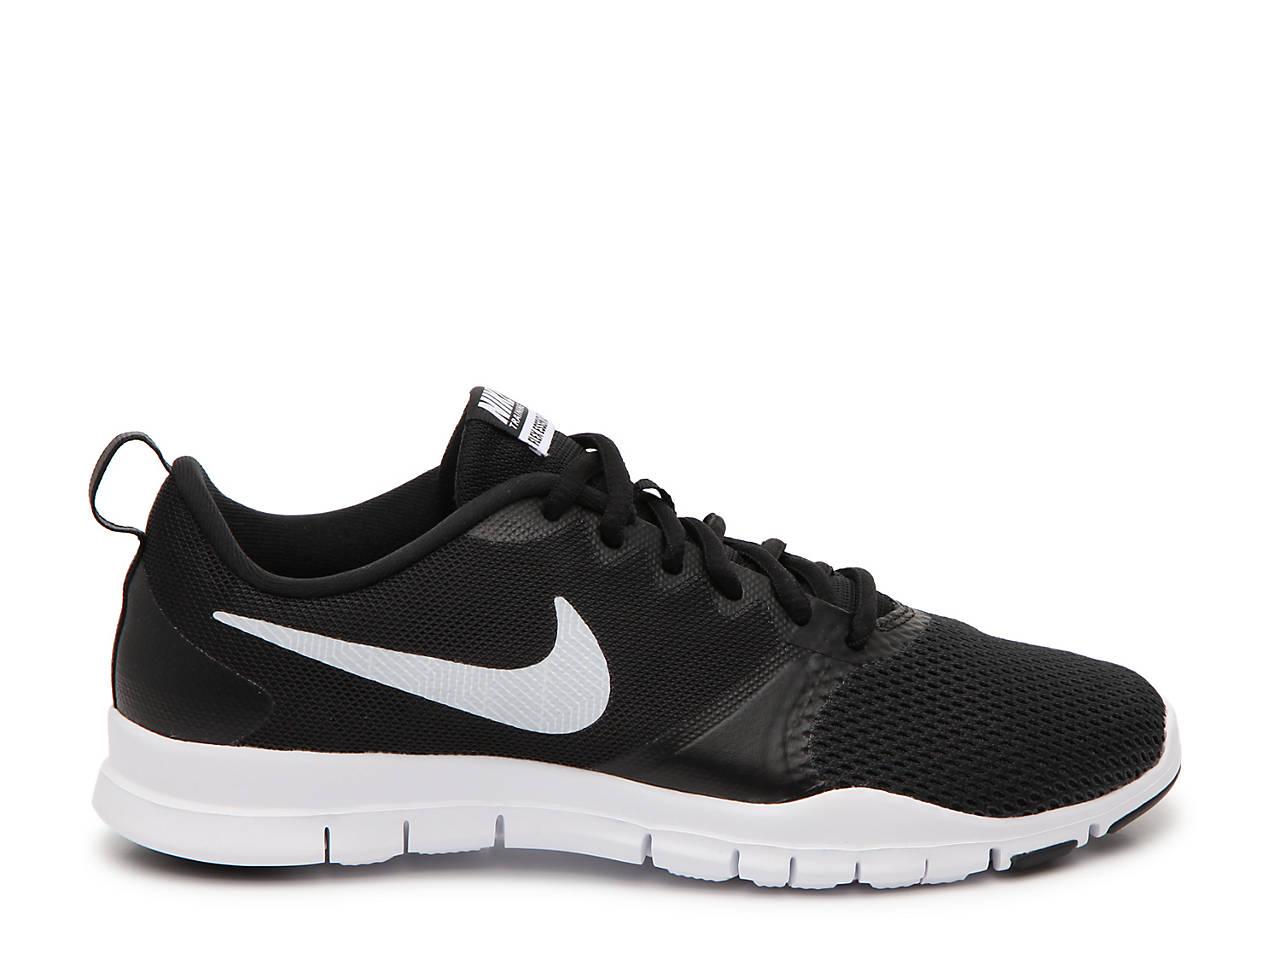 bf685b32ab Nike Flex Essential TR Lightweight Training Shoe - Women's Women's ...